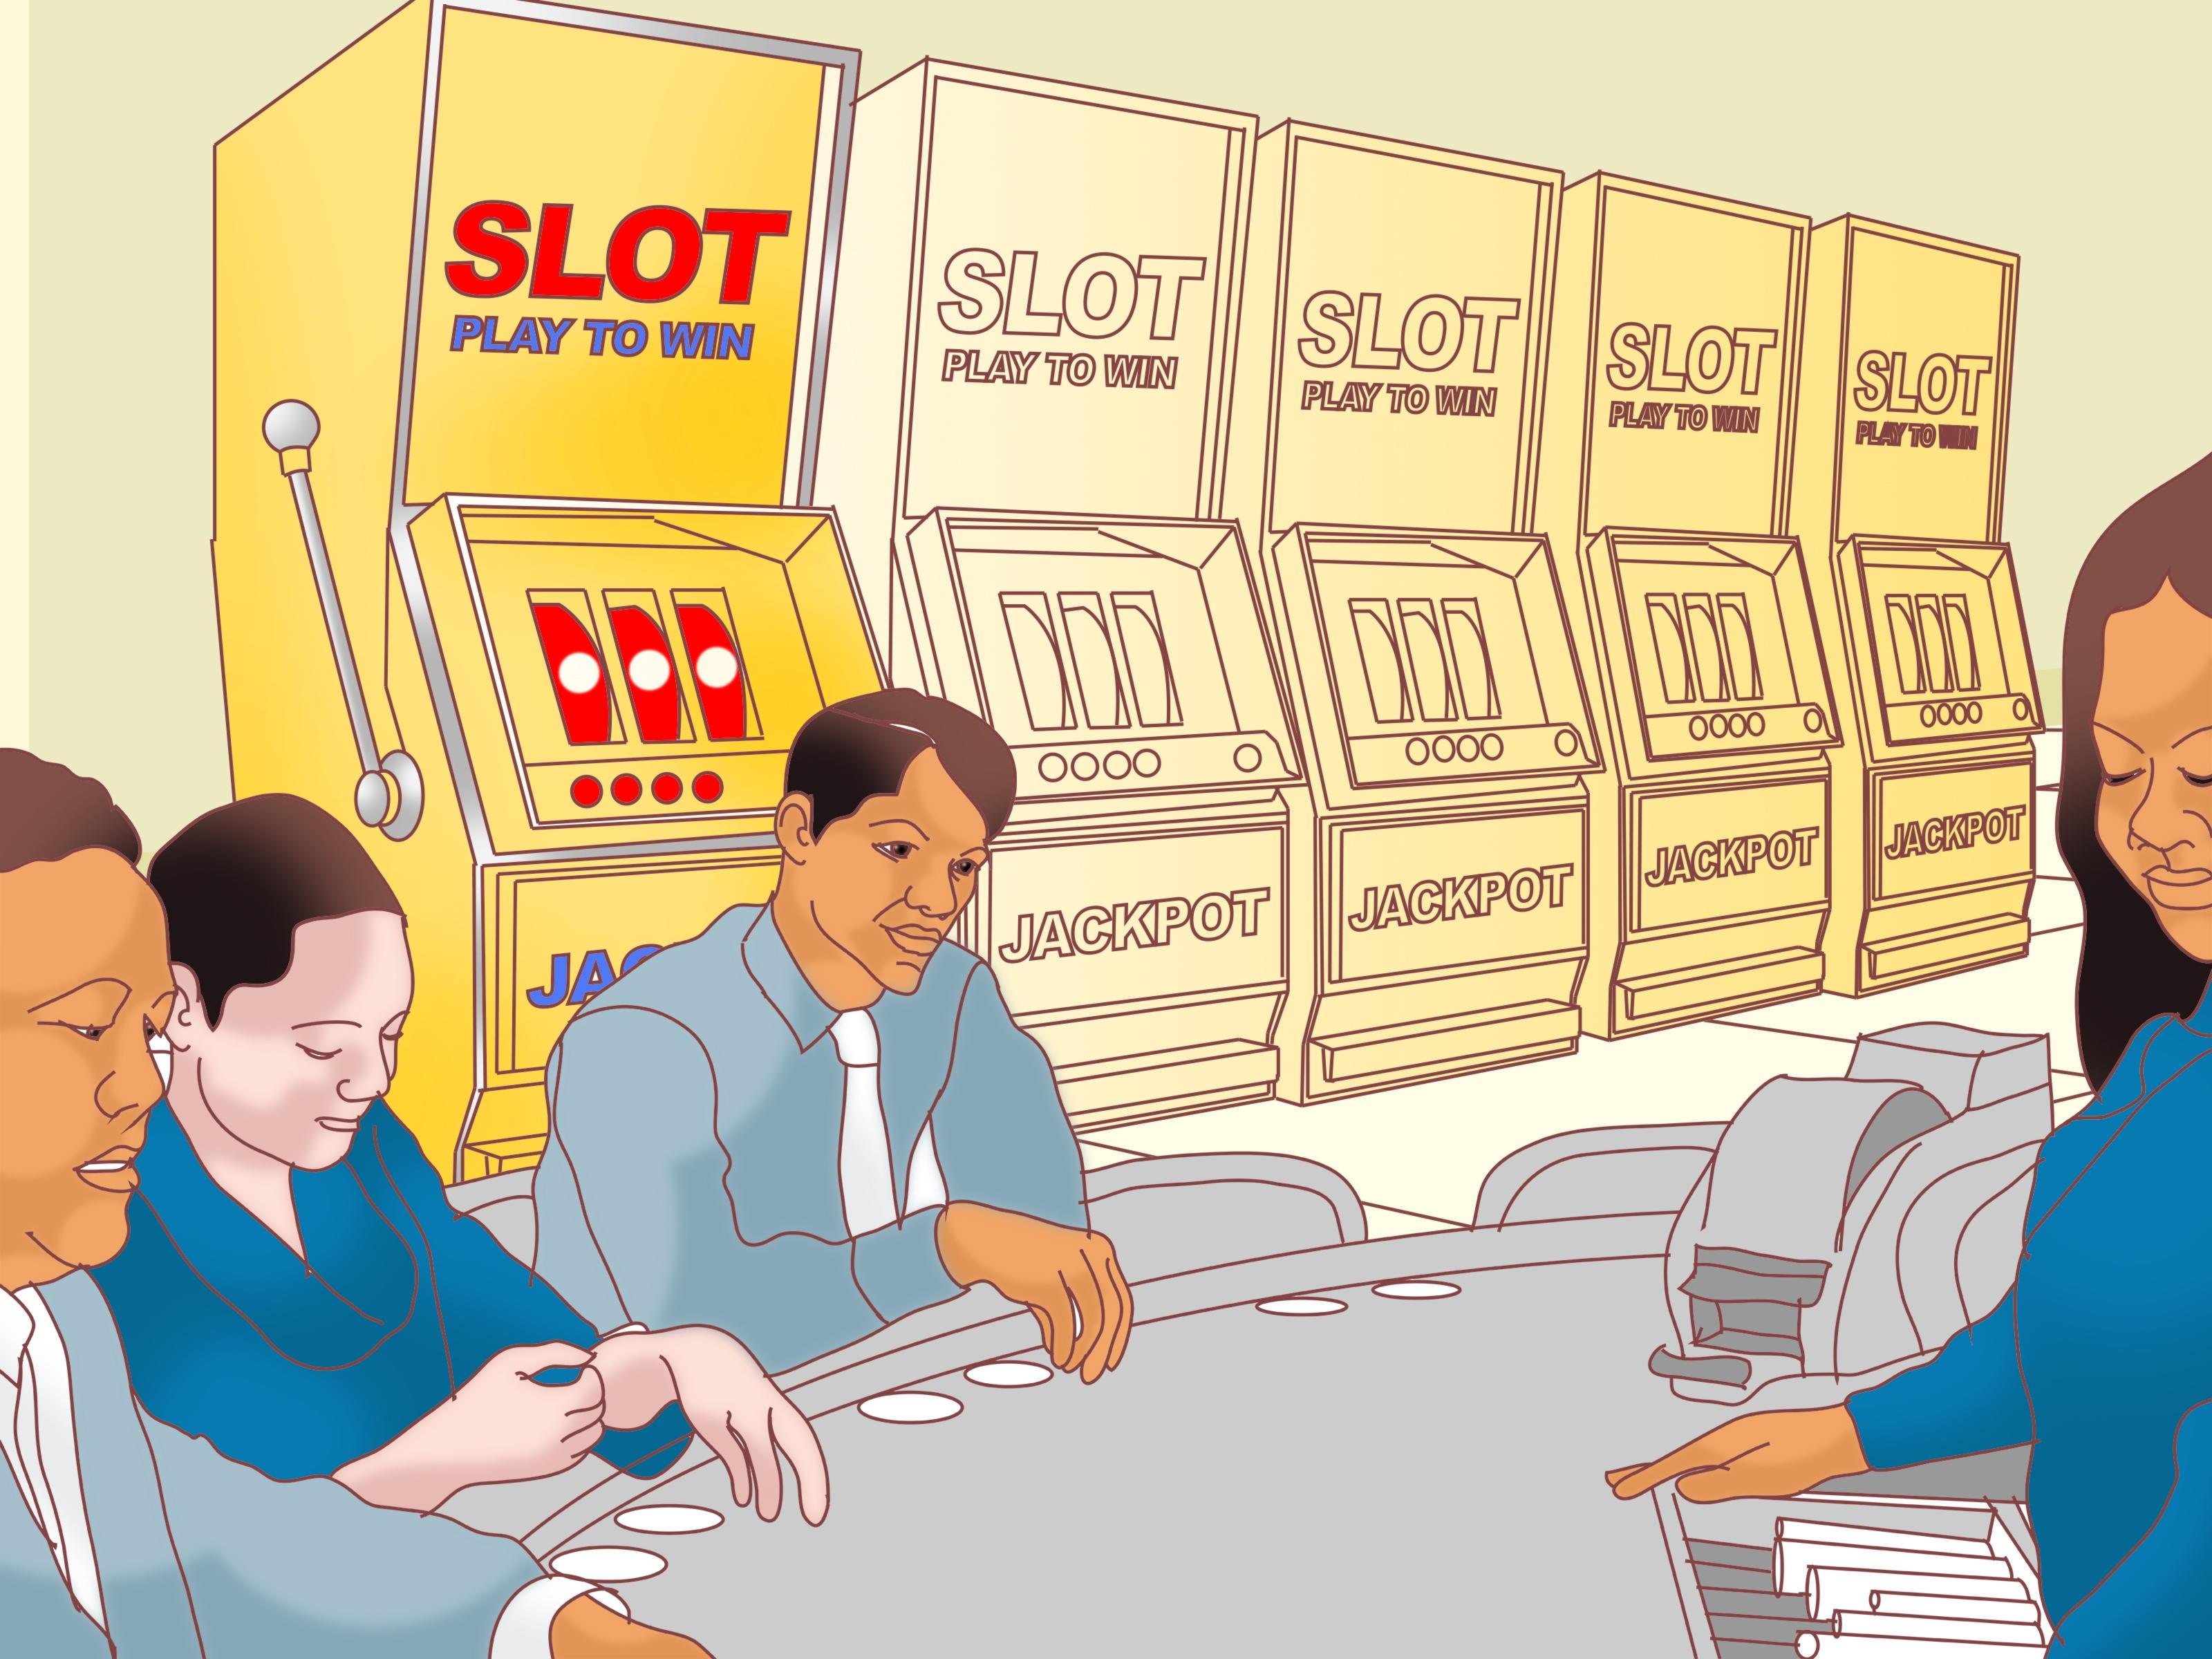 110 free spins at Mansion Bet Casino